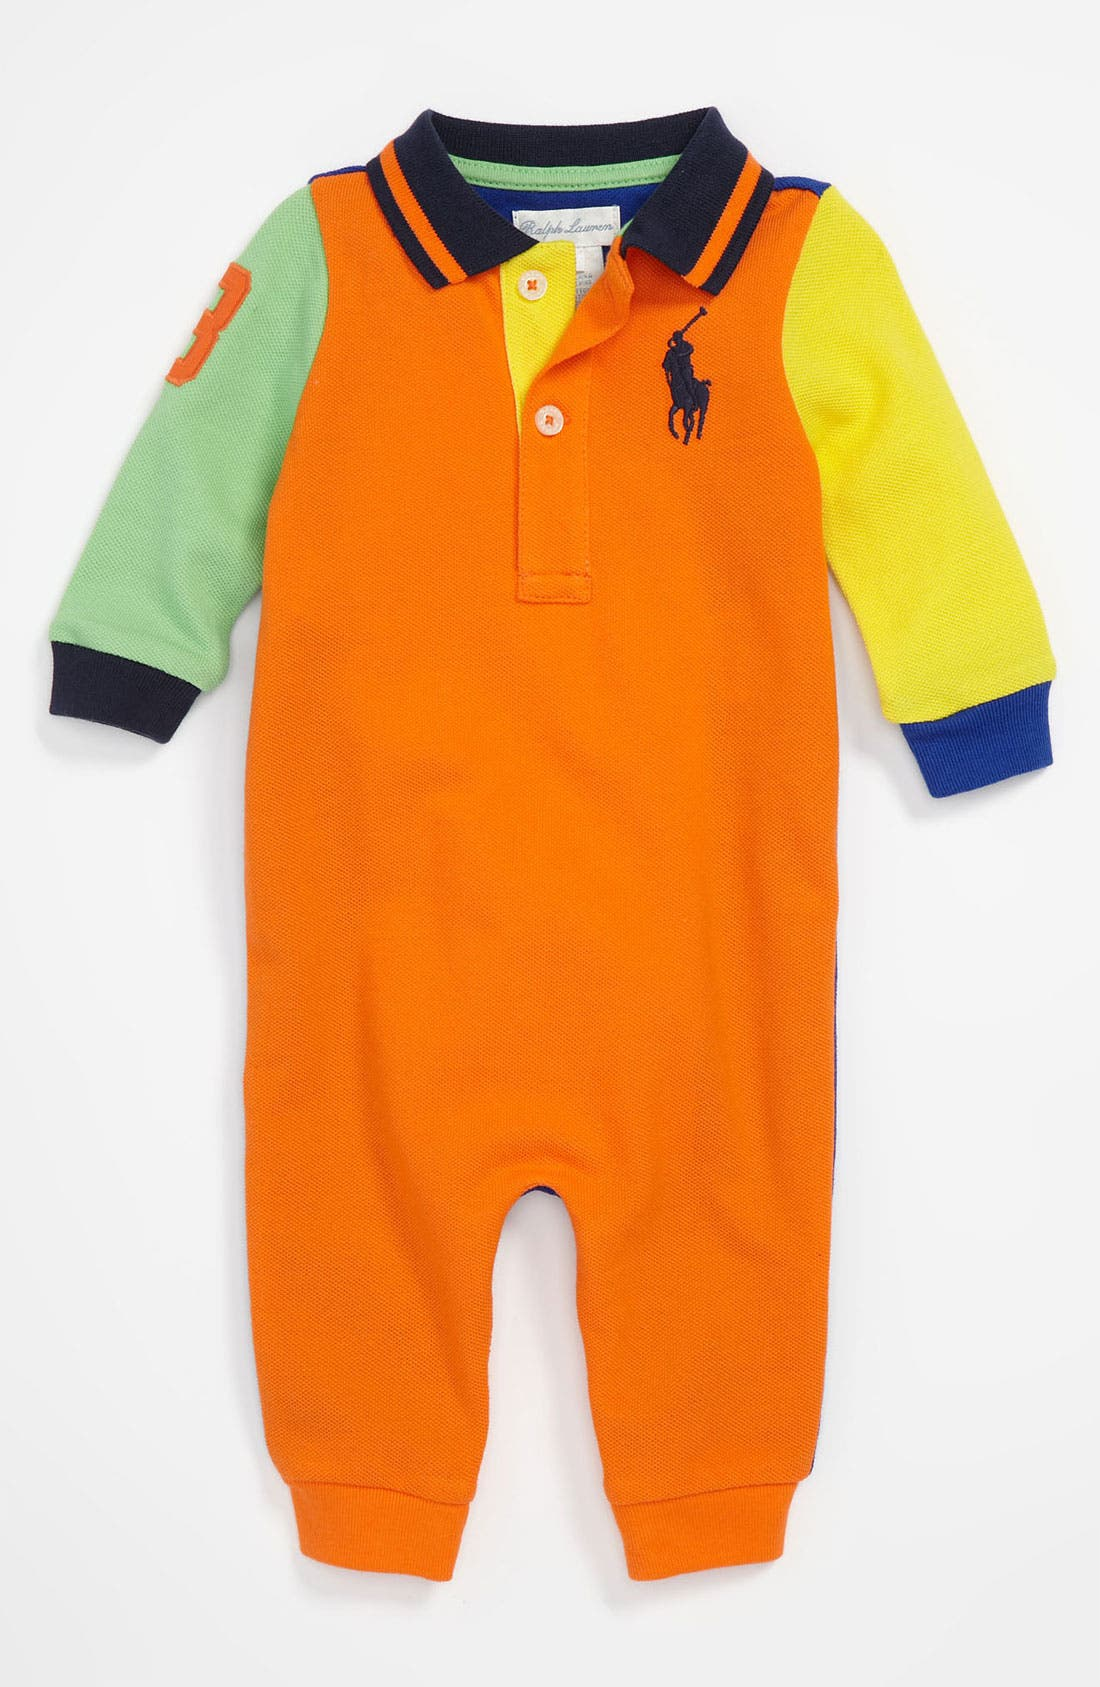 Main Image - Ralph Lauren Colorblock Romper (Infant)